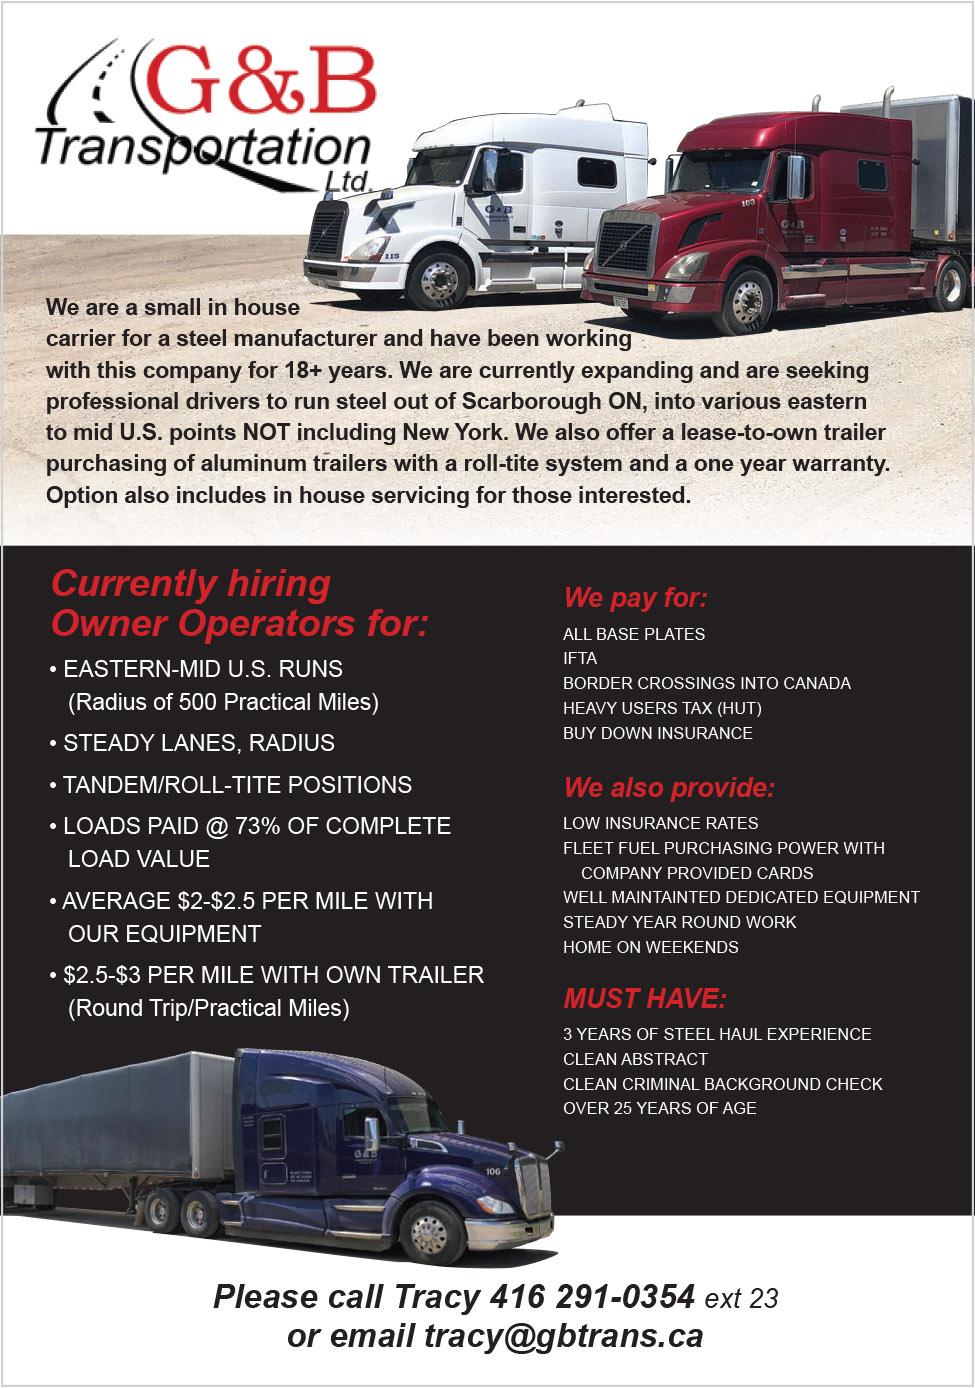 G&B Transportation Ltd.